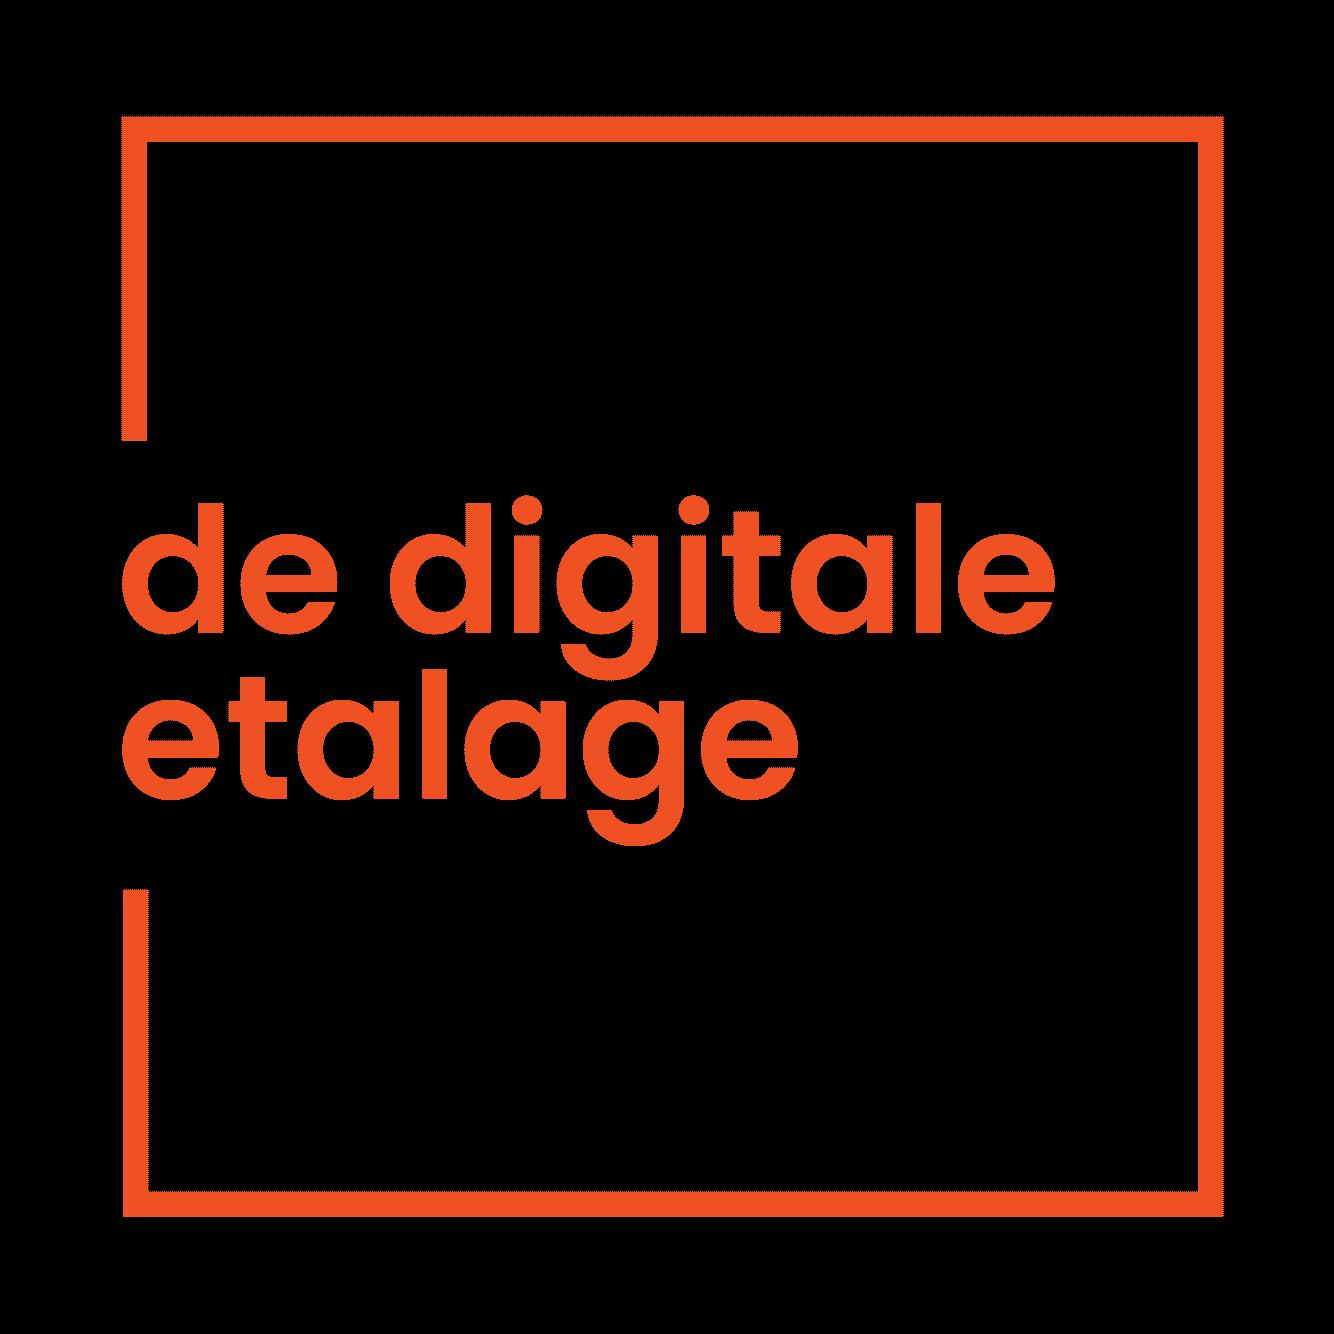 De Digitale Etalage